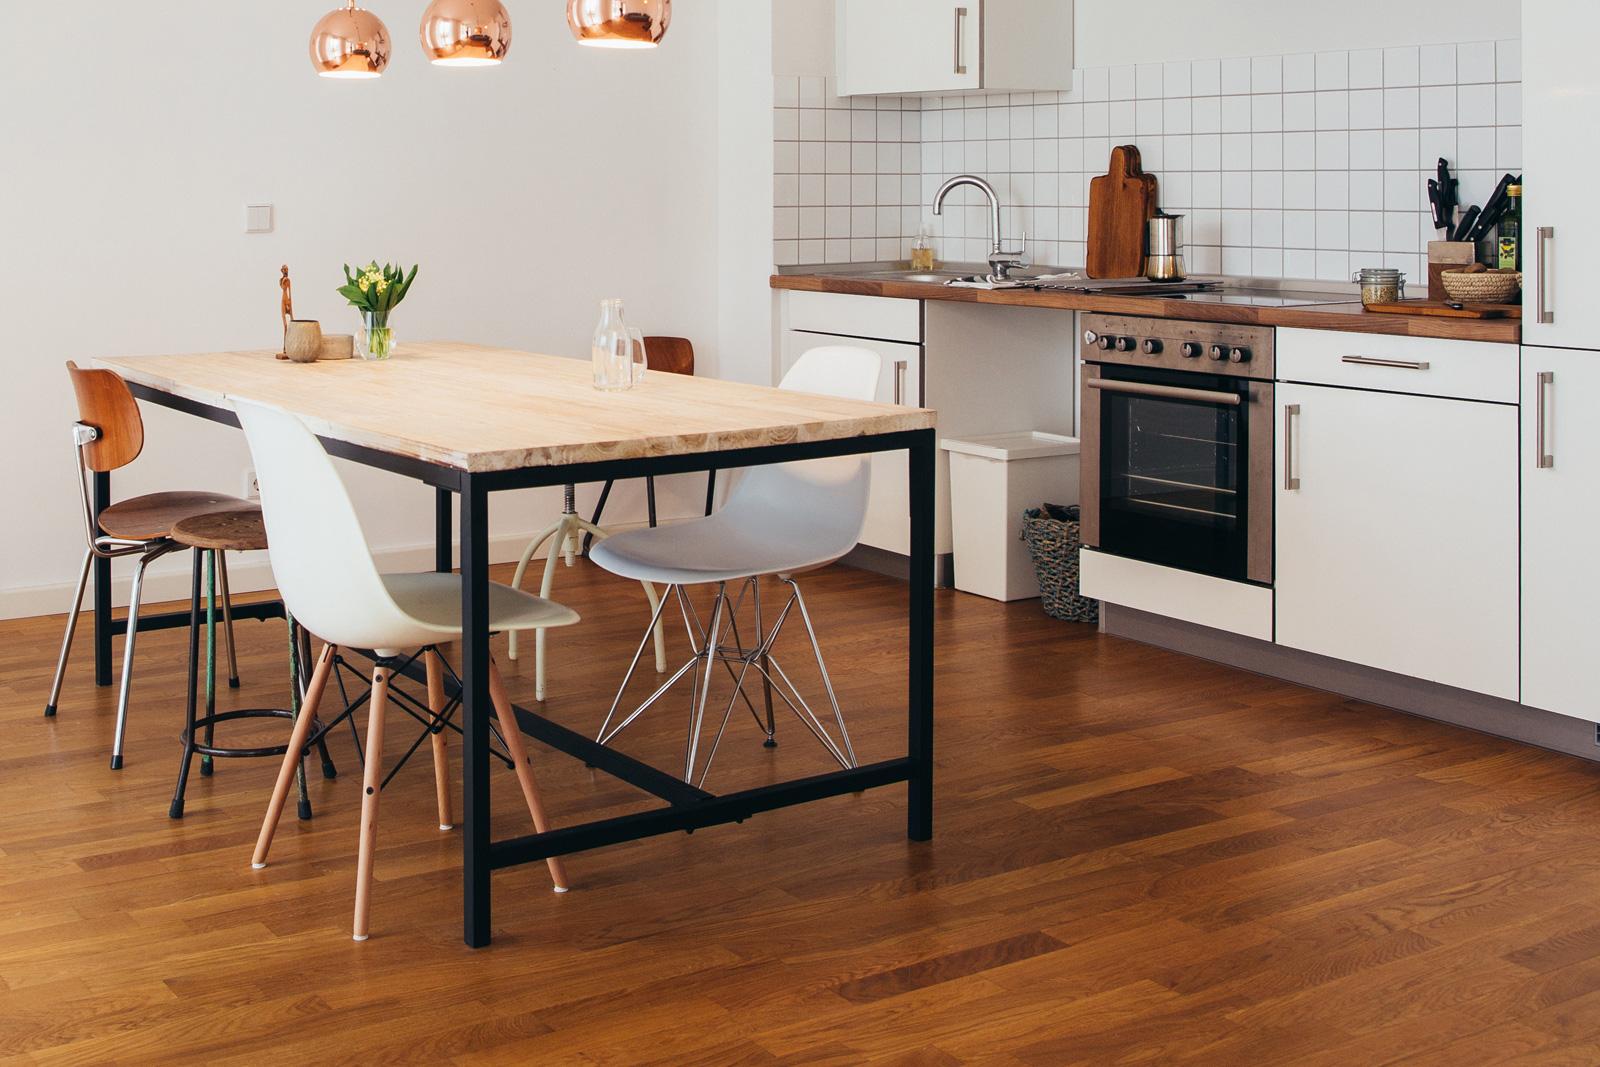 kitchen floors kitchen flooring options | best flooring for kitchens HNWQIOY